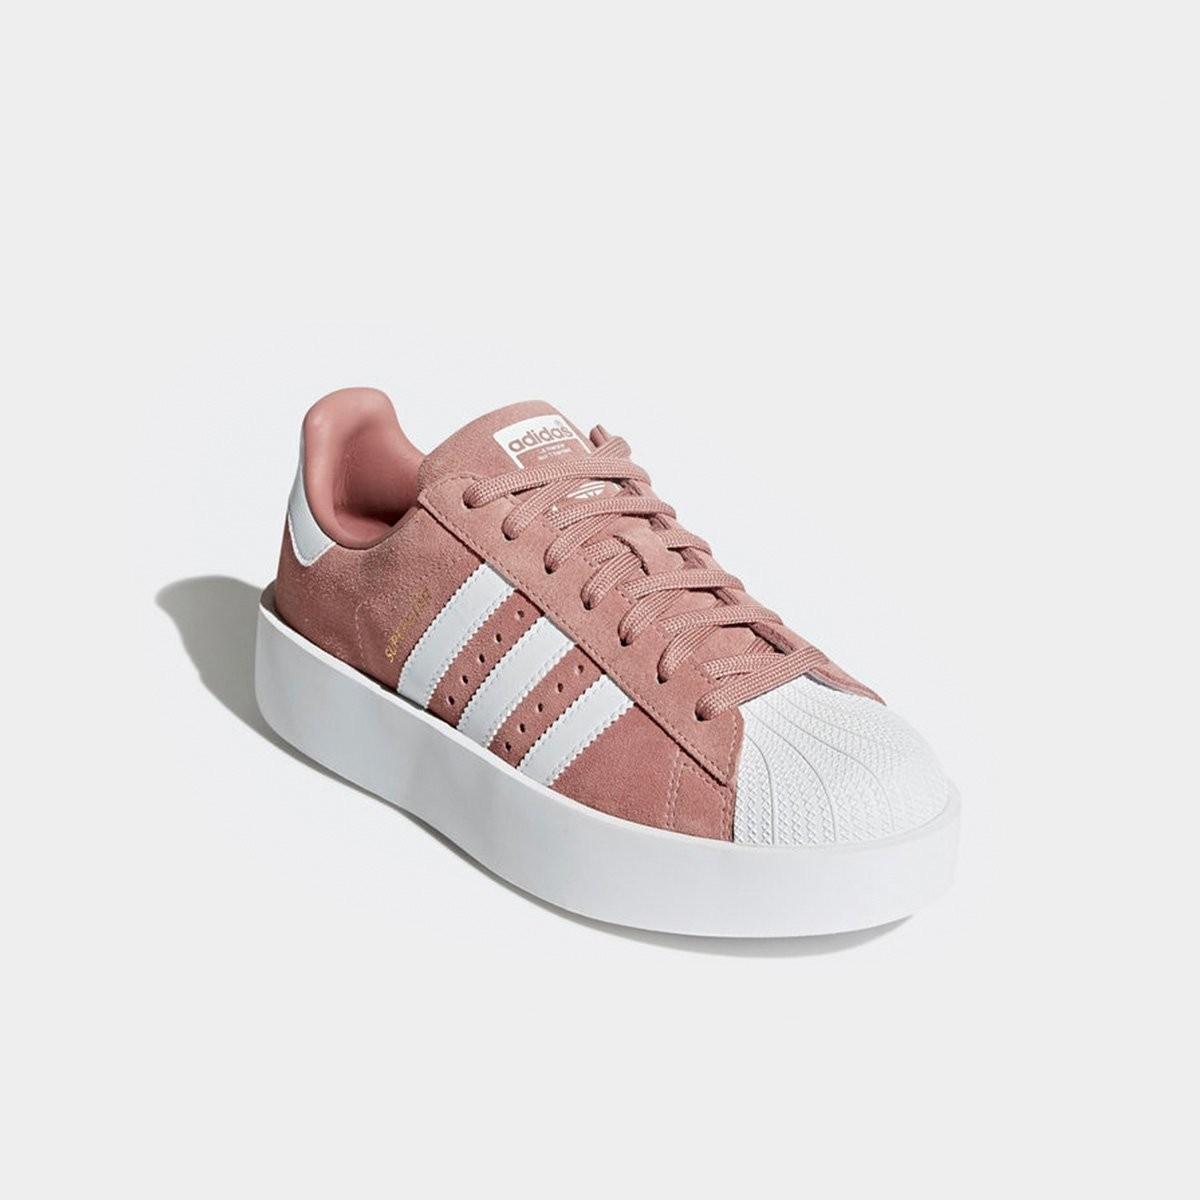 8fc8b1f7c Tênis Adidas Superstar Bold Platform Feminino Rosa